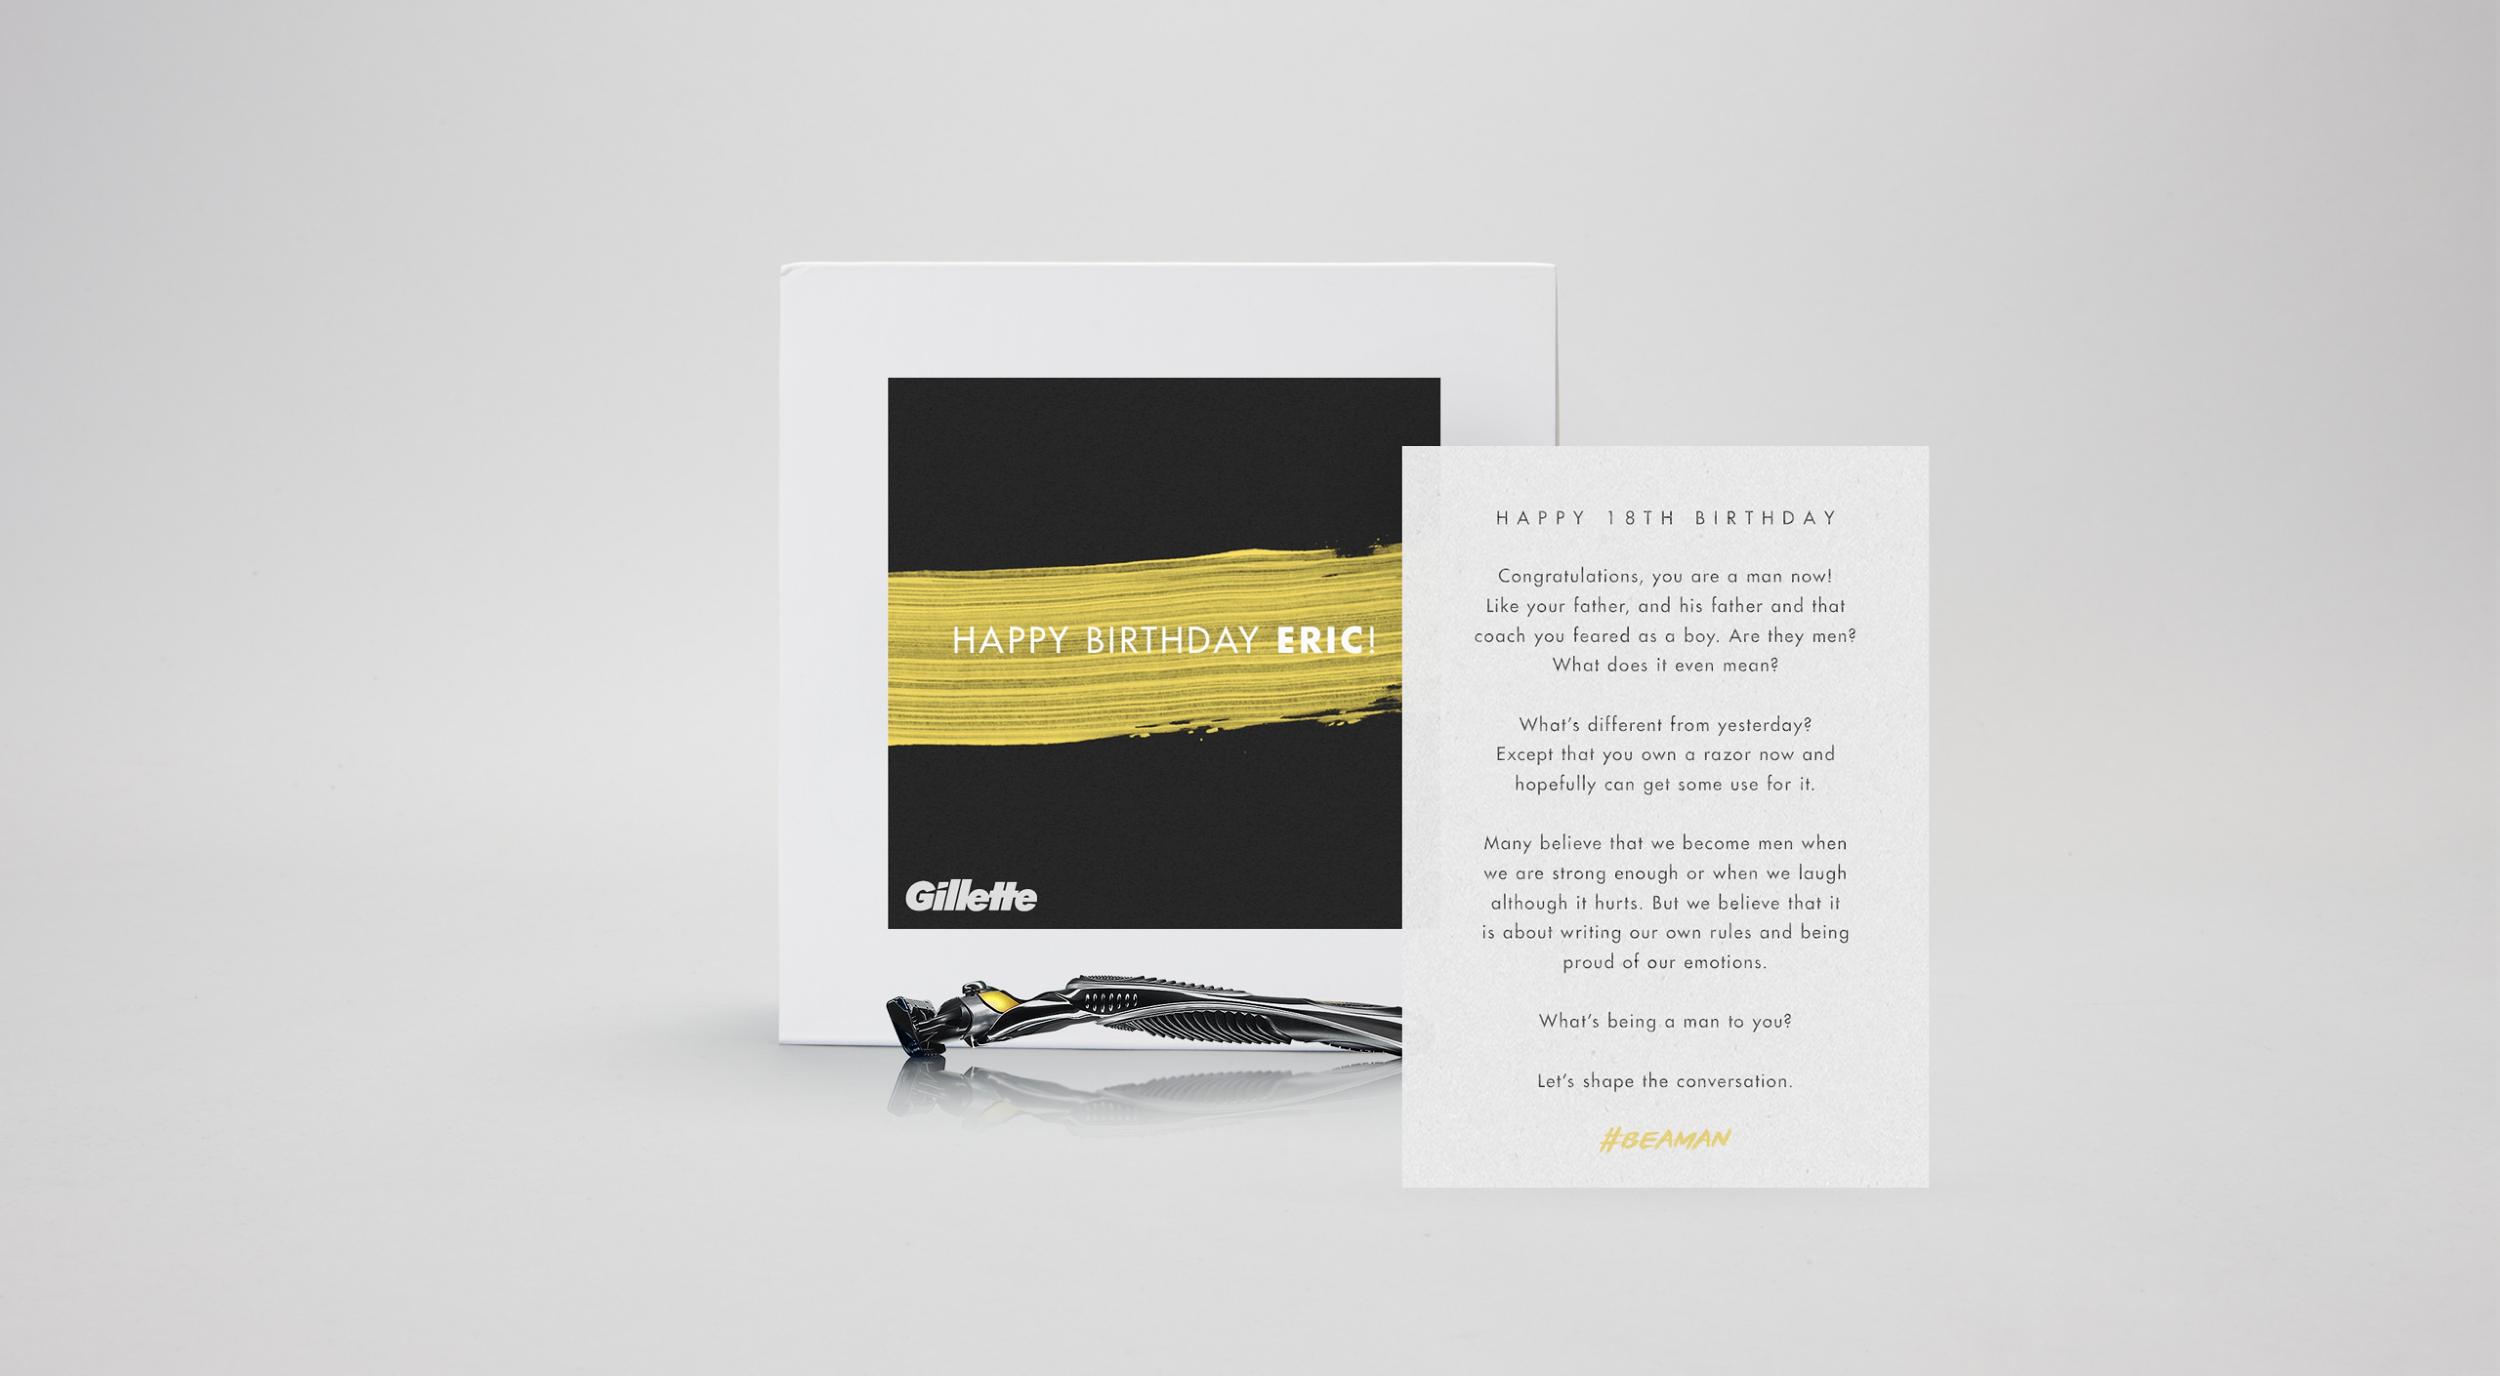 Gillette-be-a-man-18th-birthday-razor